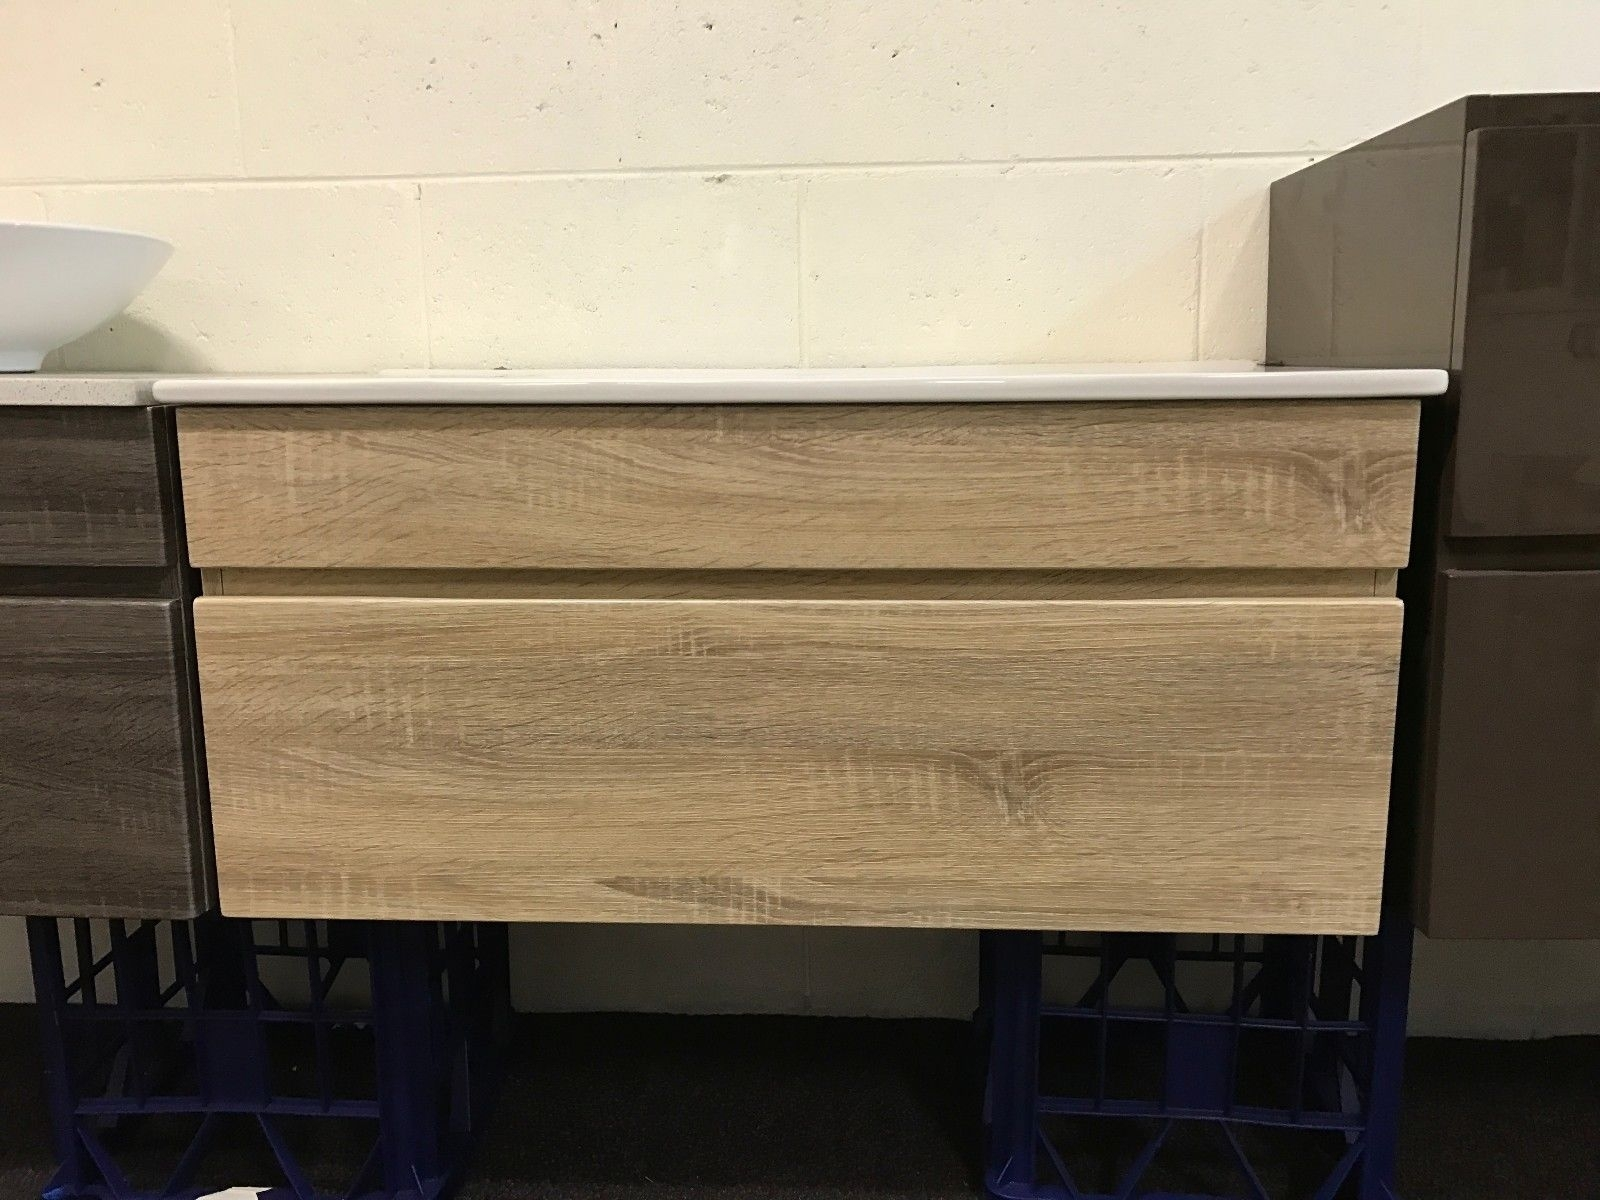 Asti 900mm White Oak Pvc Thermal Foil Timber Wood Grain